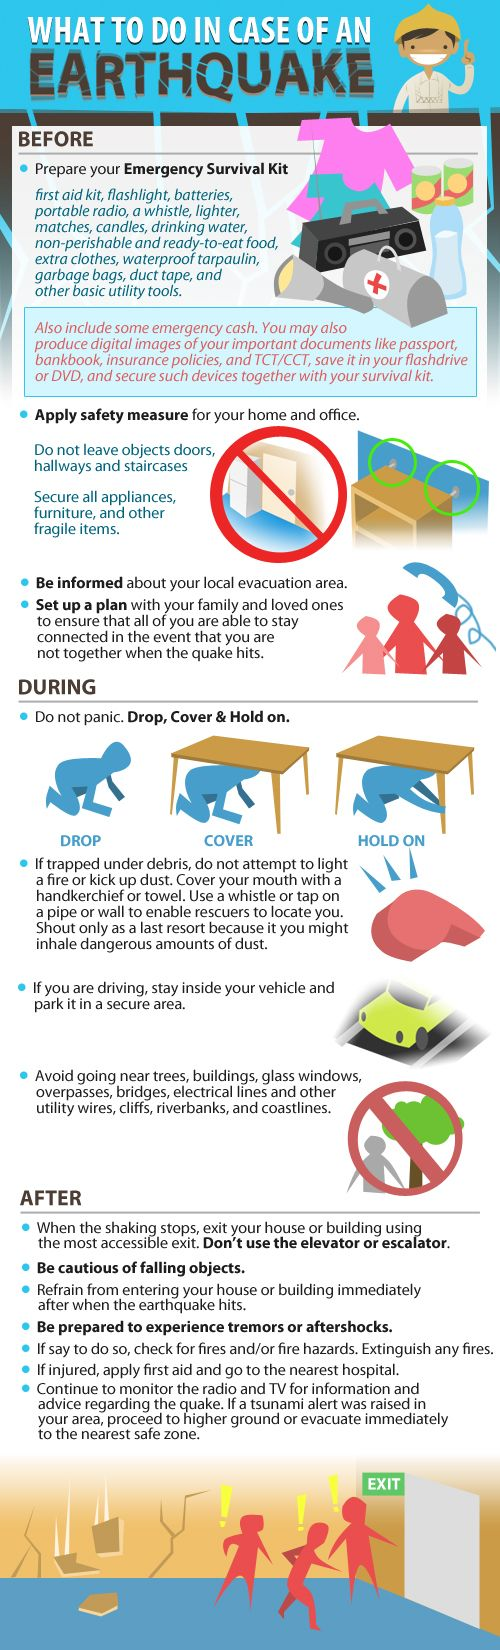 Earthquake Preparedness Tips Infographics Source Http Energizepinas Com Earthquake Prepared Earthquake Preparedness Earthquake Safety Tips Earthquake Safety